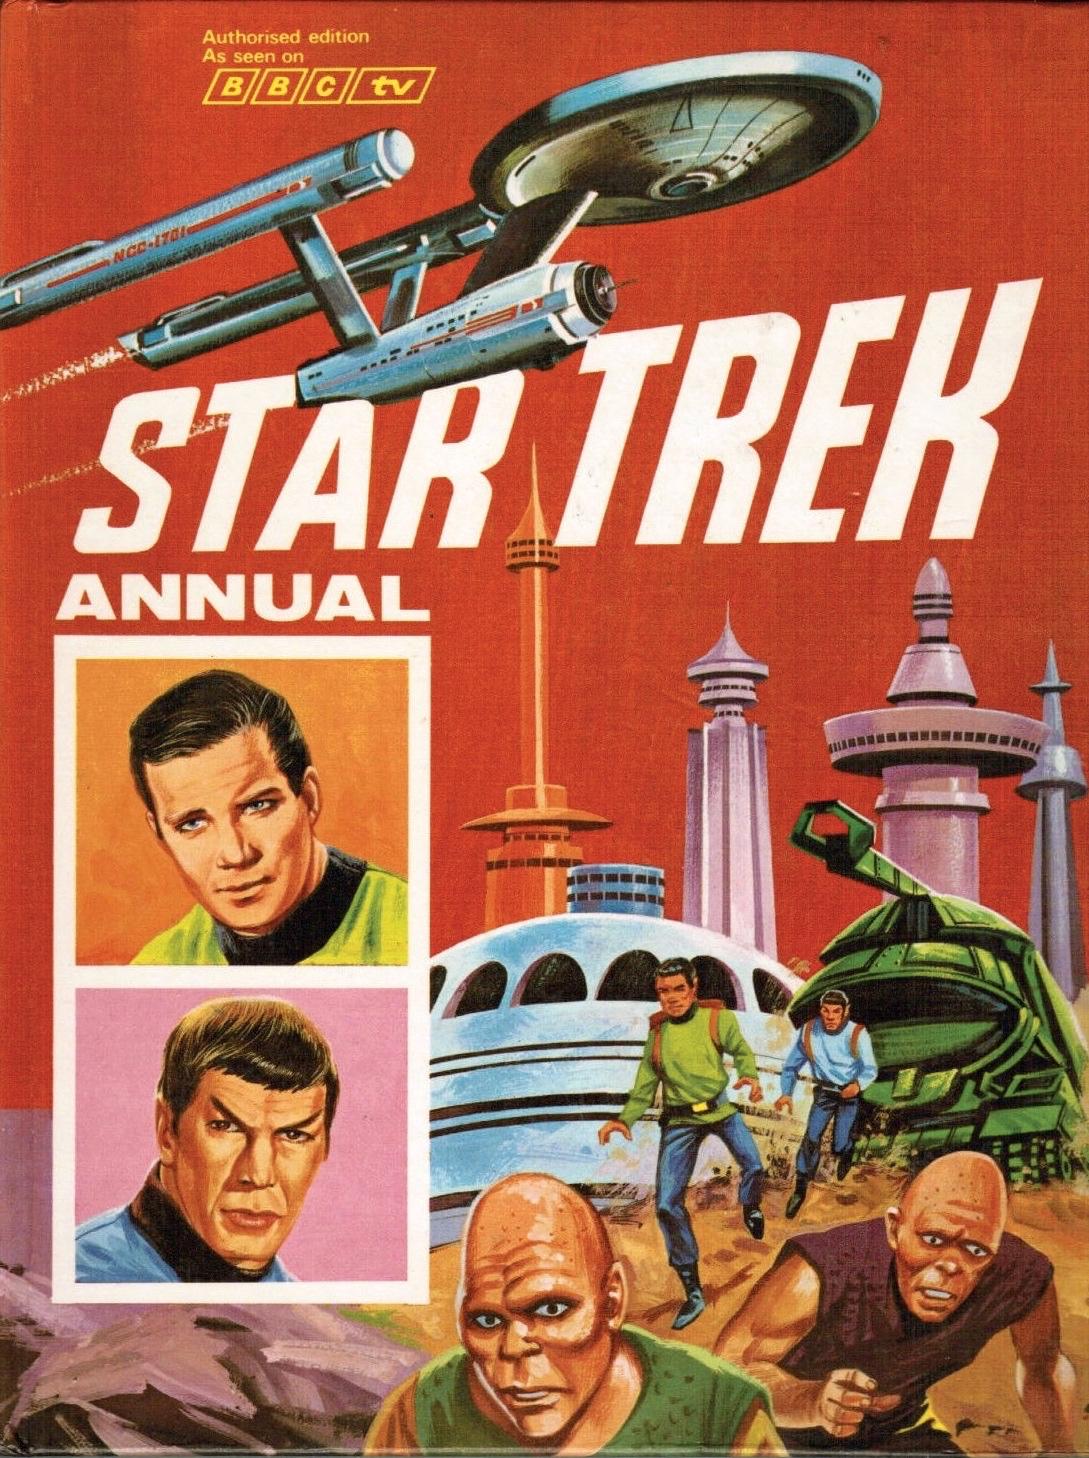 Star Trek Annual 1969